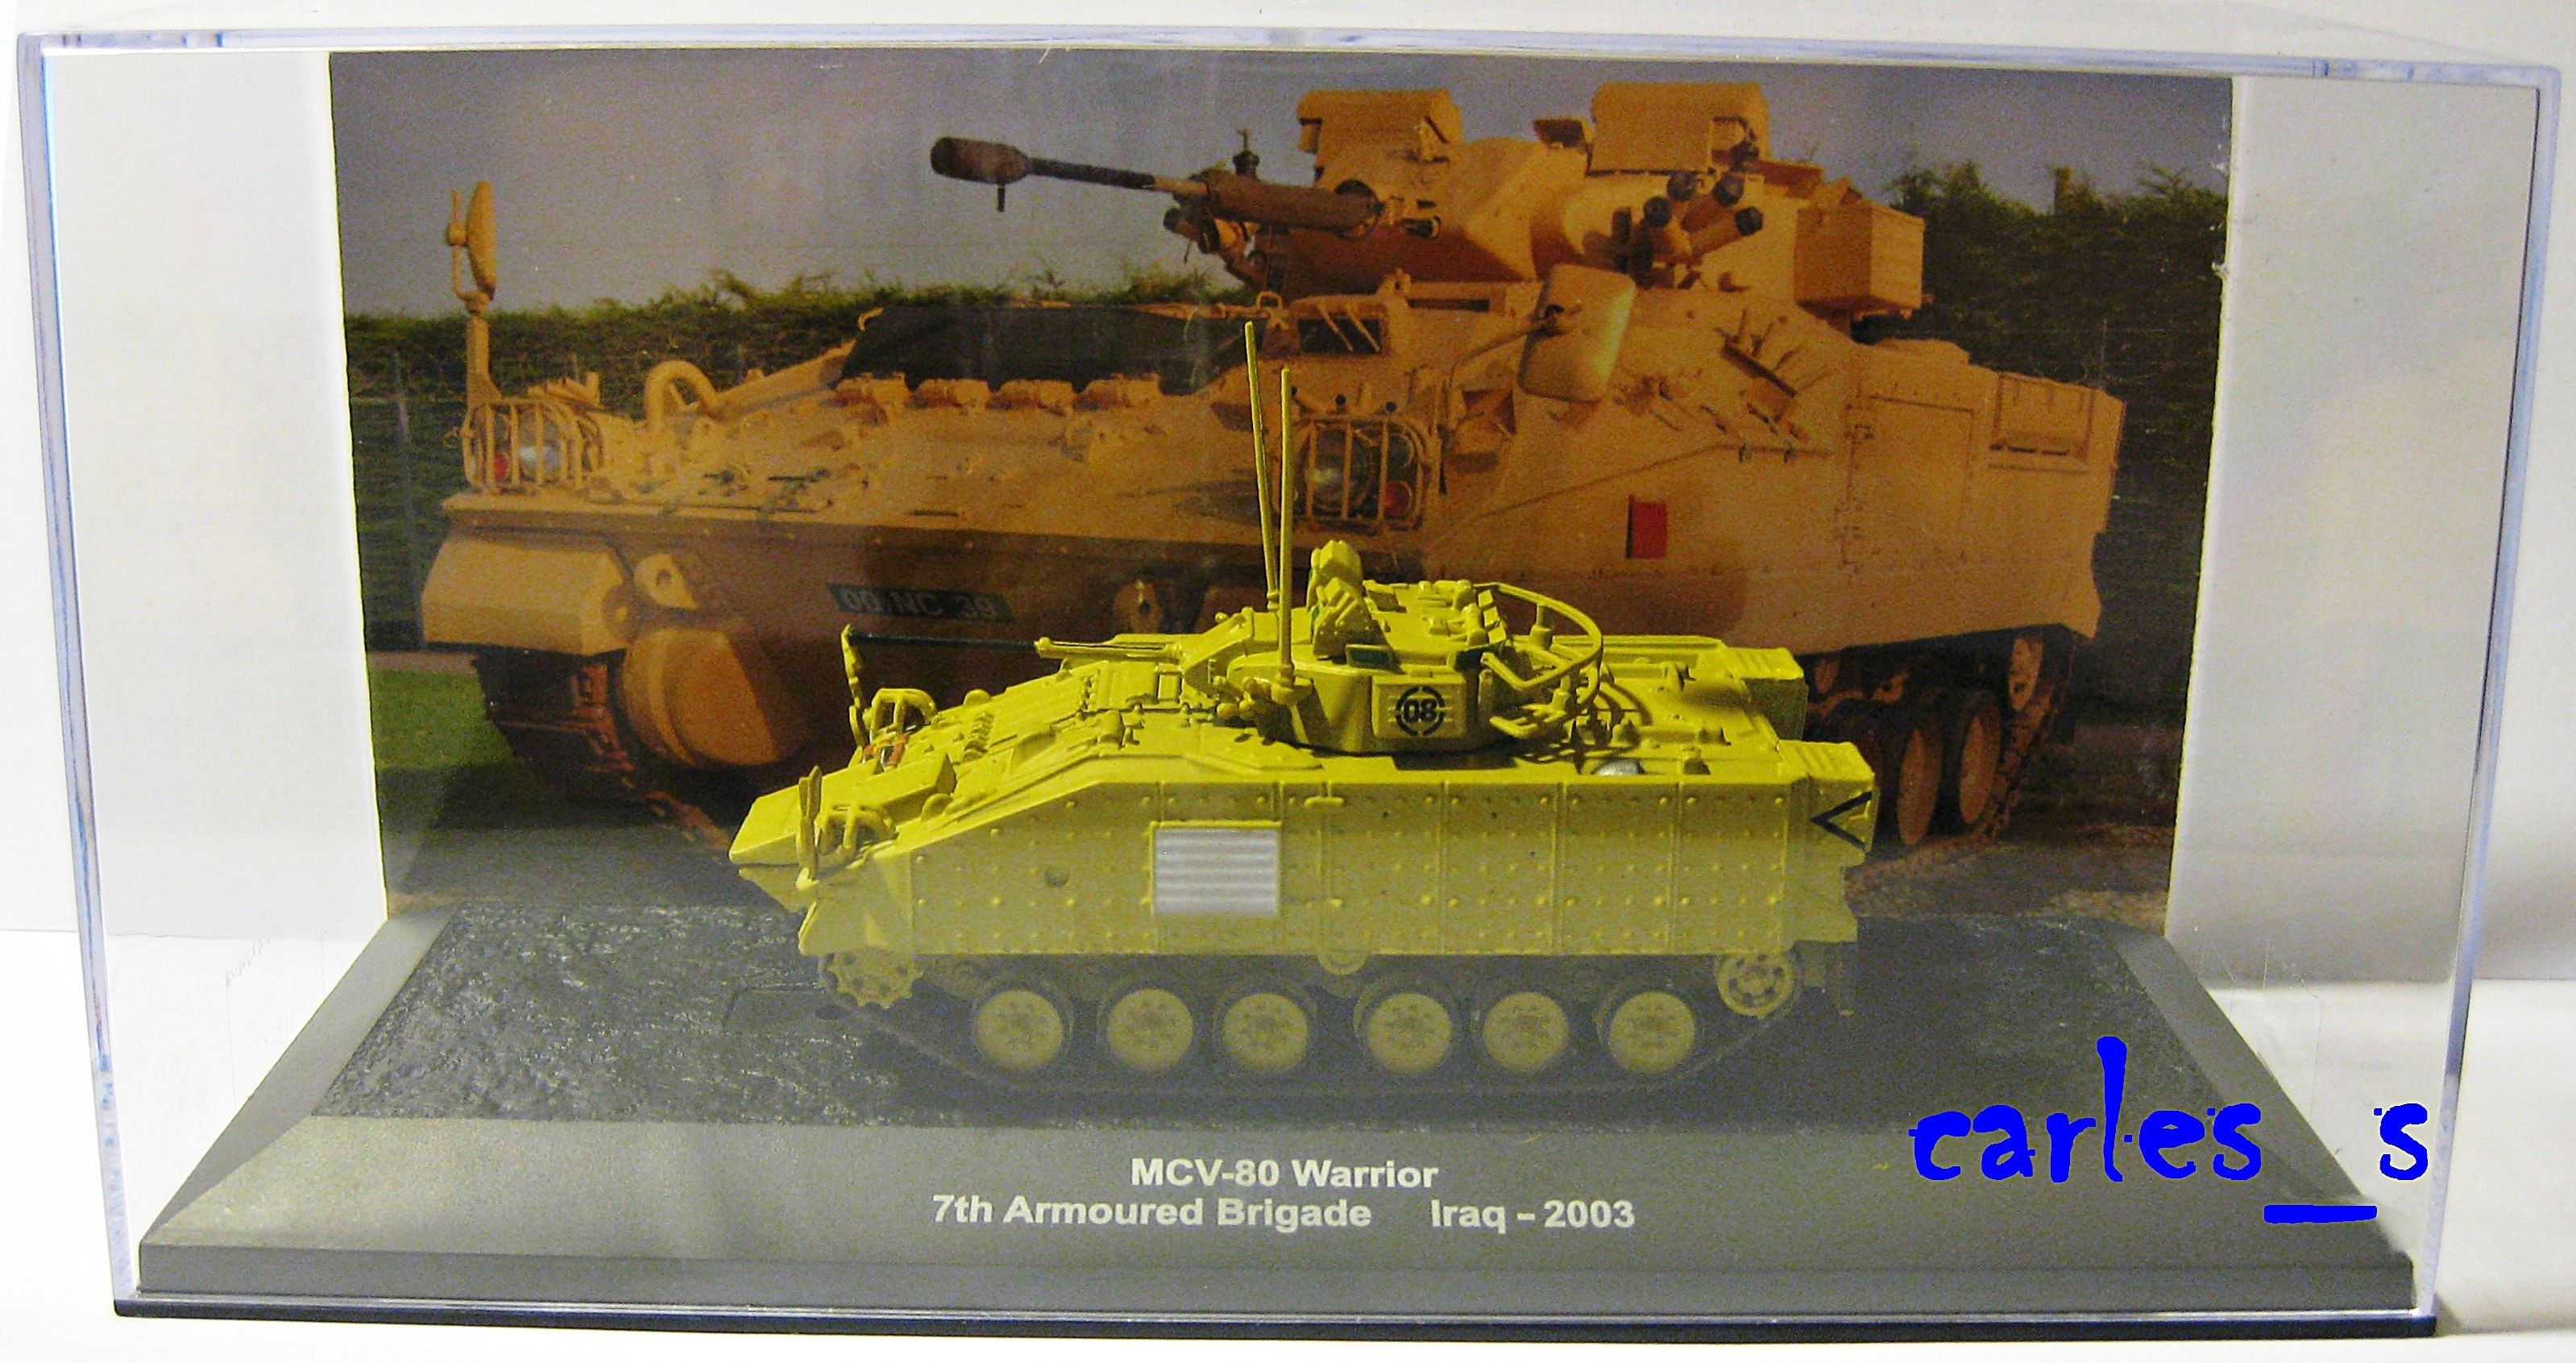 MCV-80 Warrior 7th Armoured Brigade - Iraq 2003 1/72 ALTAYA IXO tank